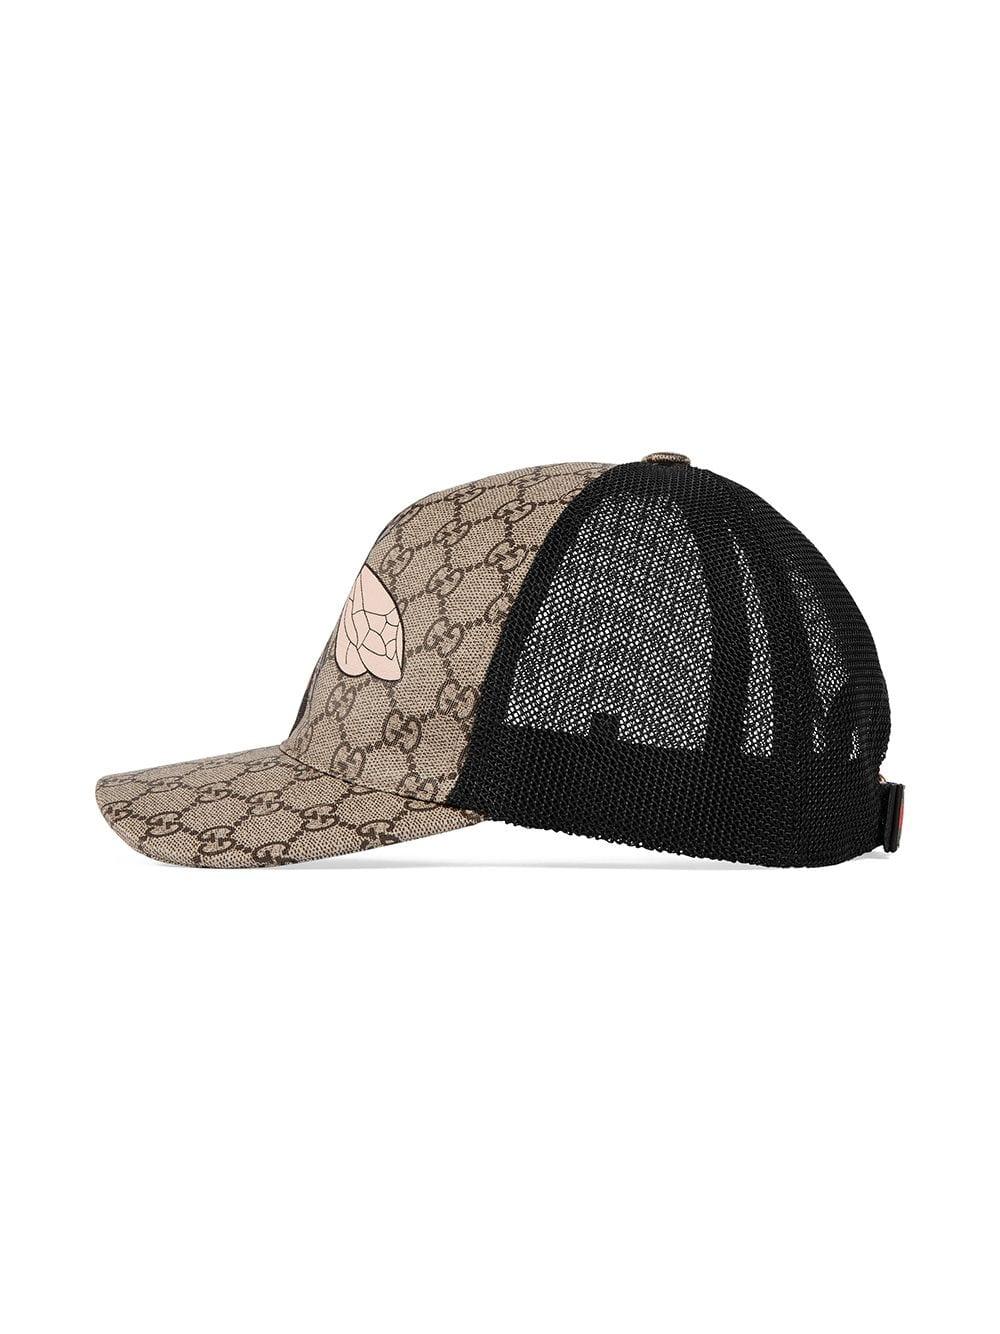 e5a2d63014b5a3 Gucci Bee print GG Supreme baseball hat - Neutrals in 2019 ...